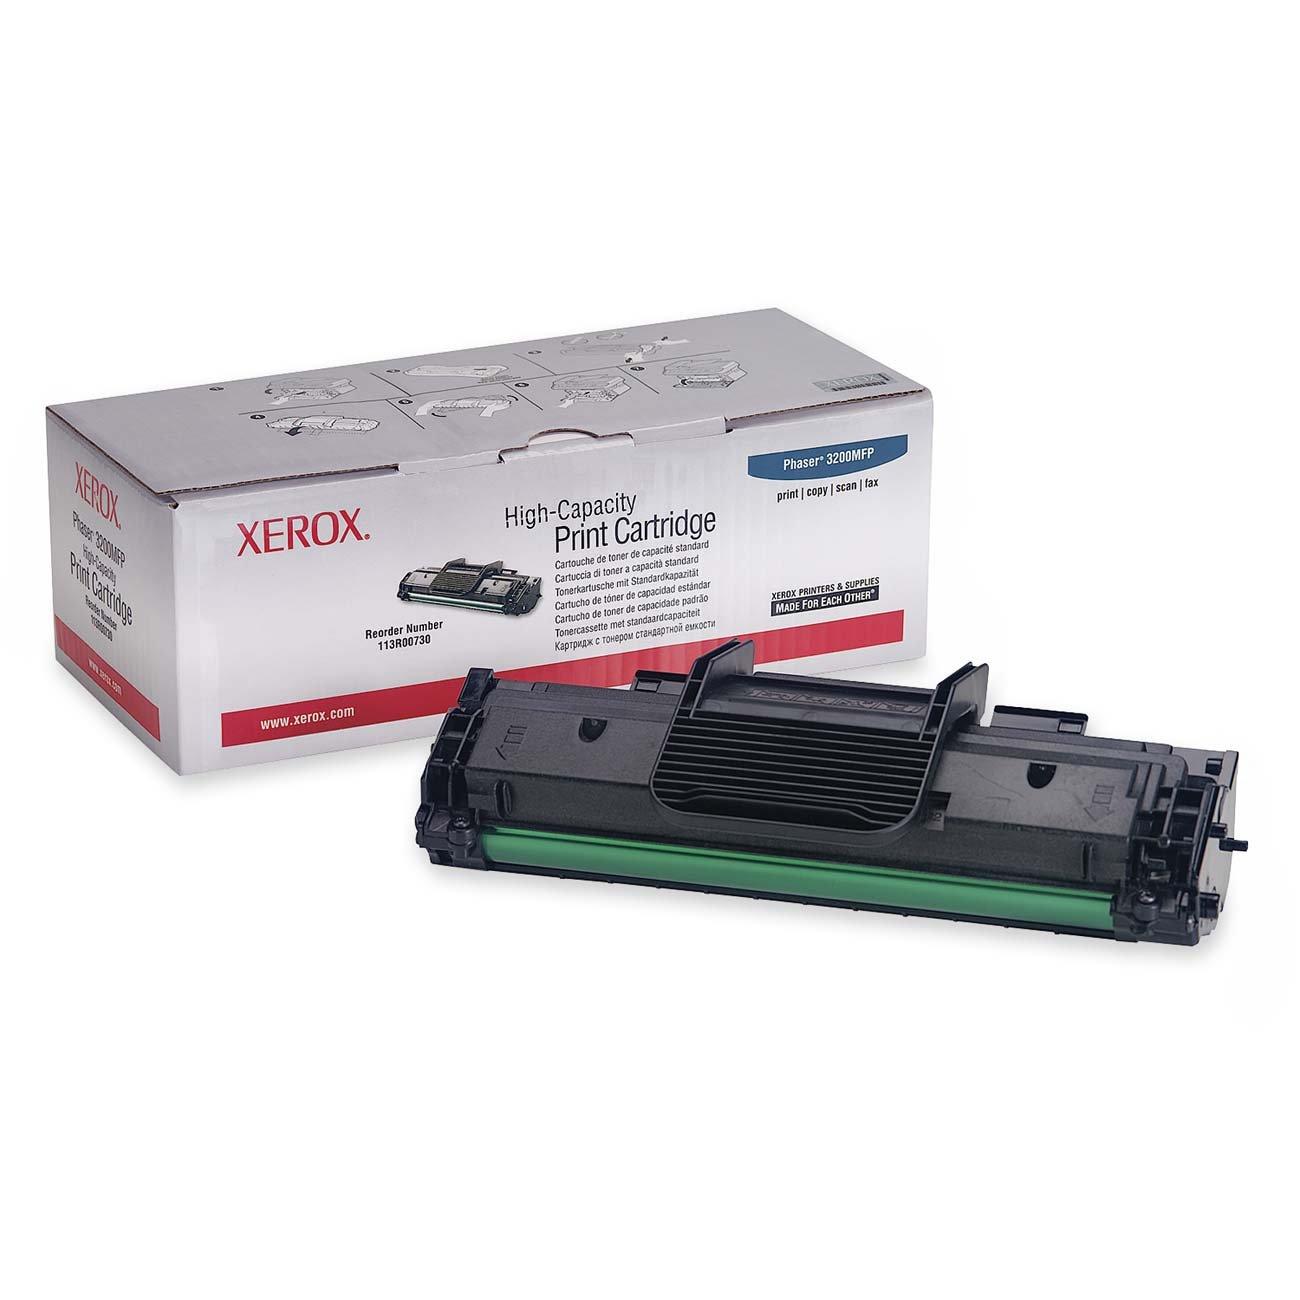 Toner Original XEROX 113R00730 Phaser 3200 (Black)